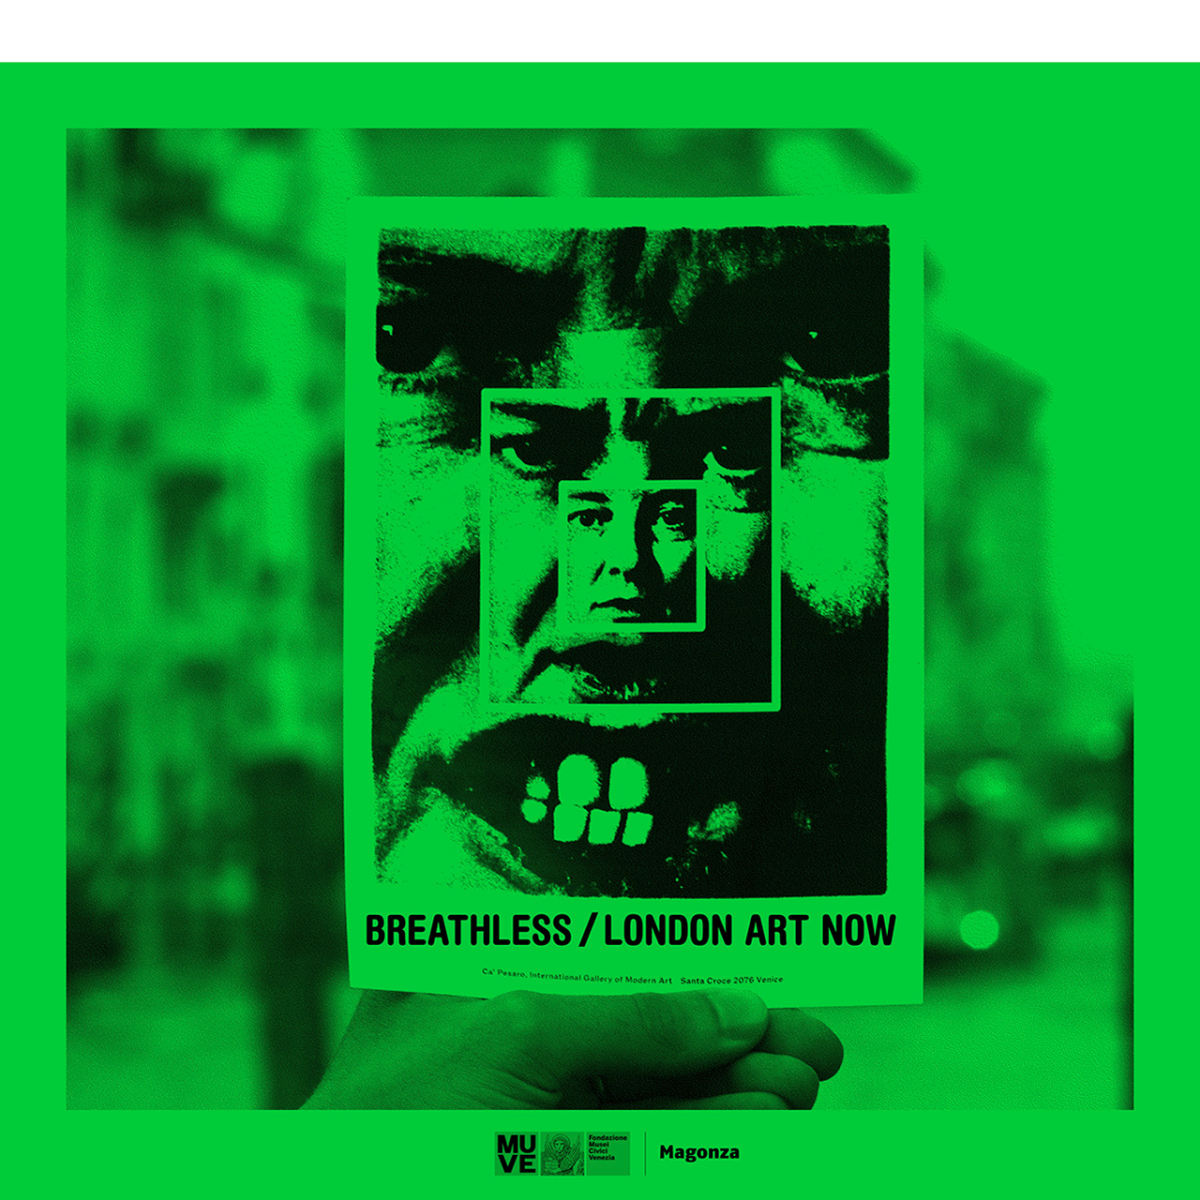 Breathless London Art Now